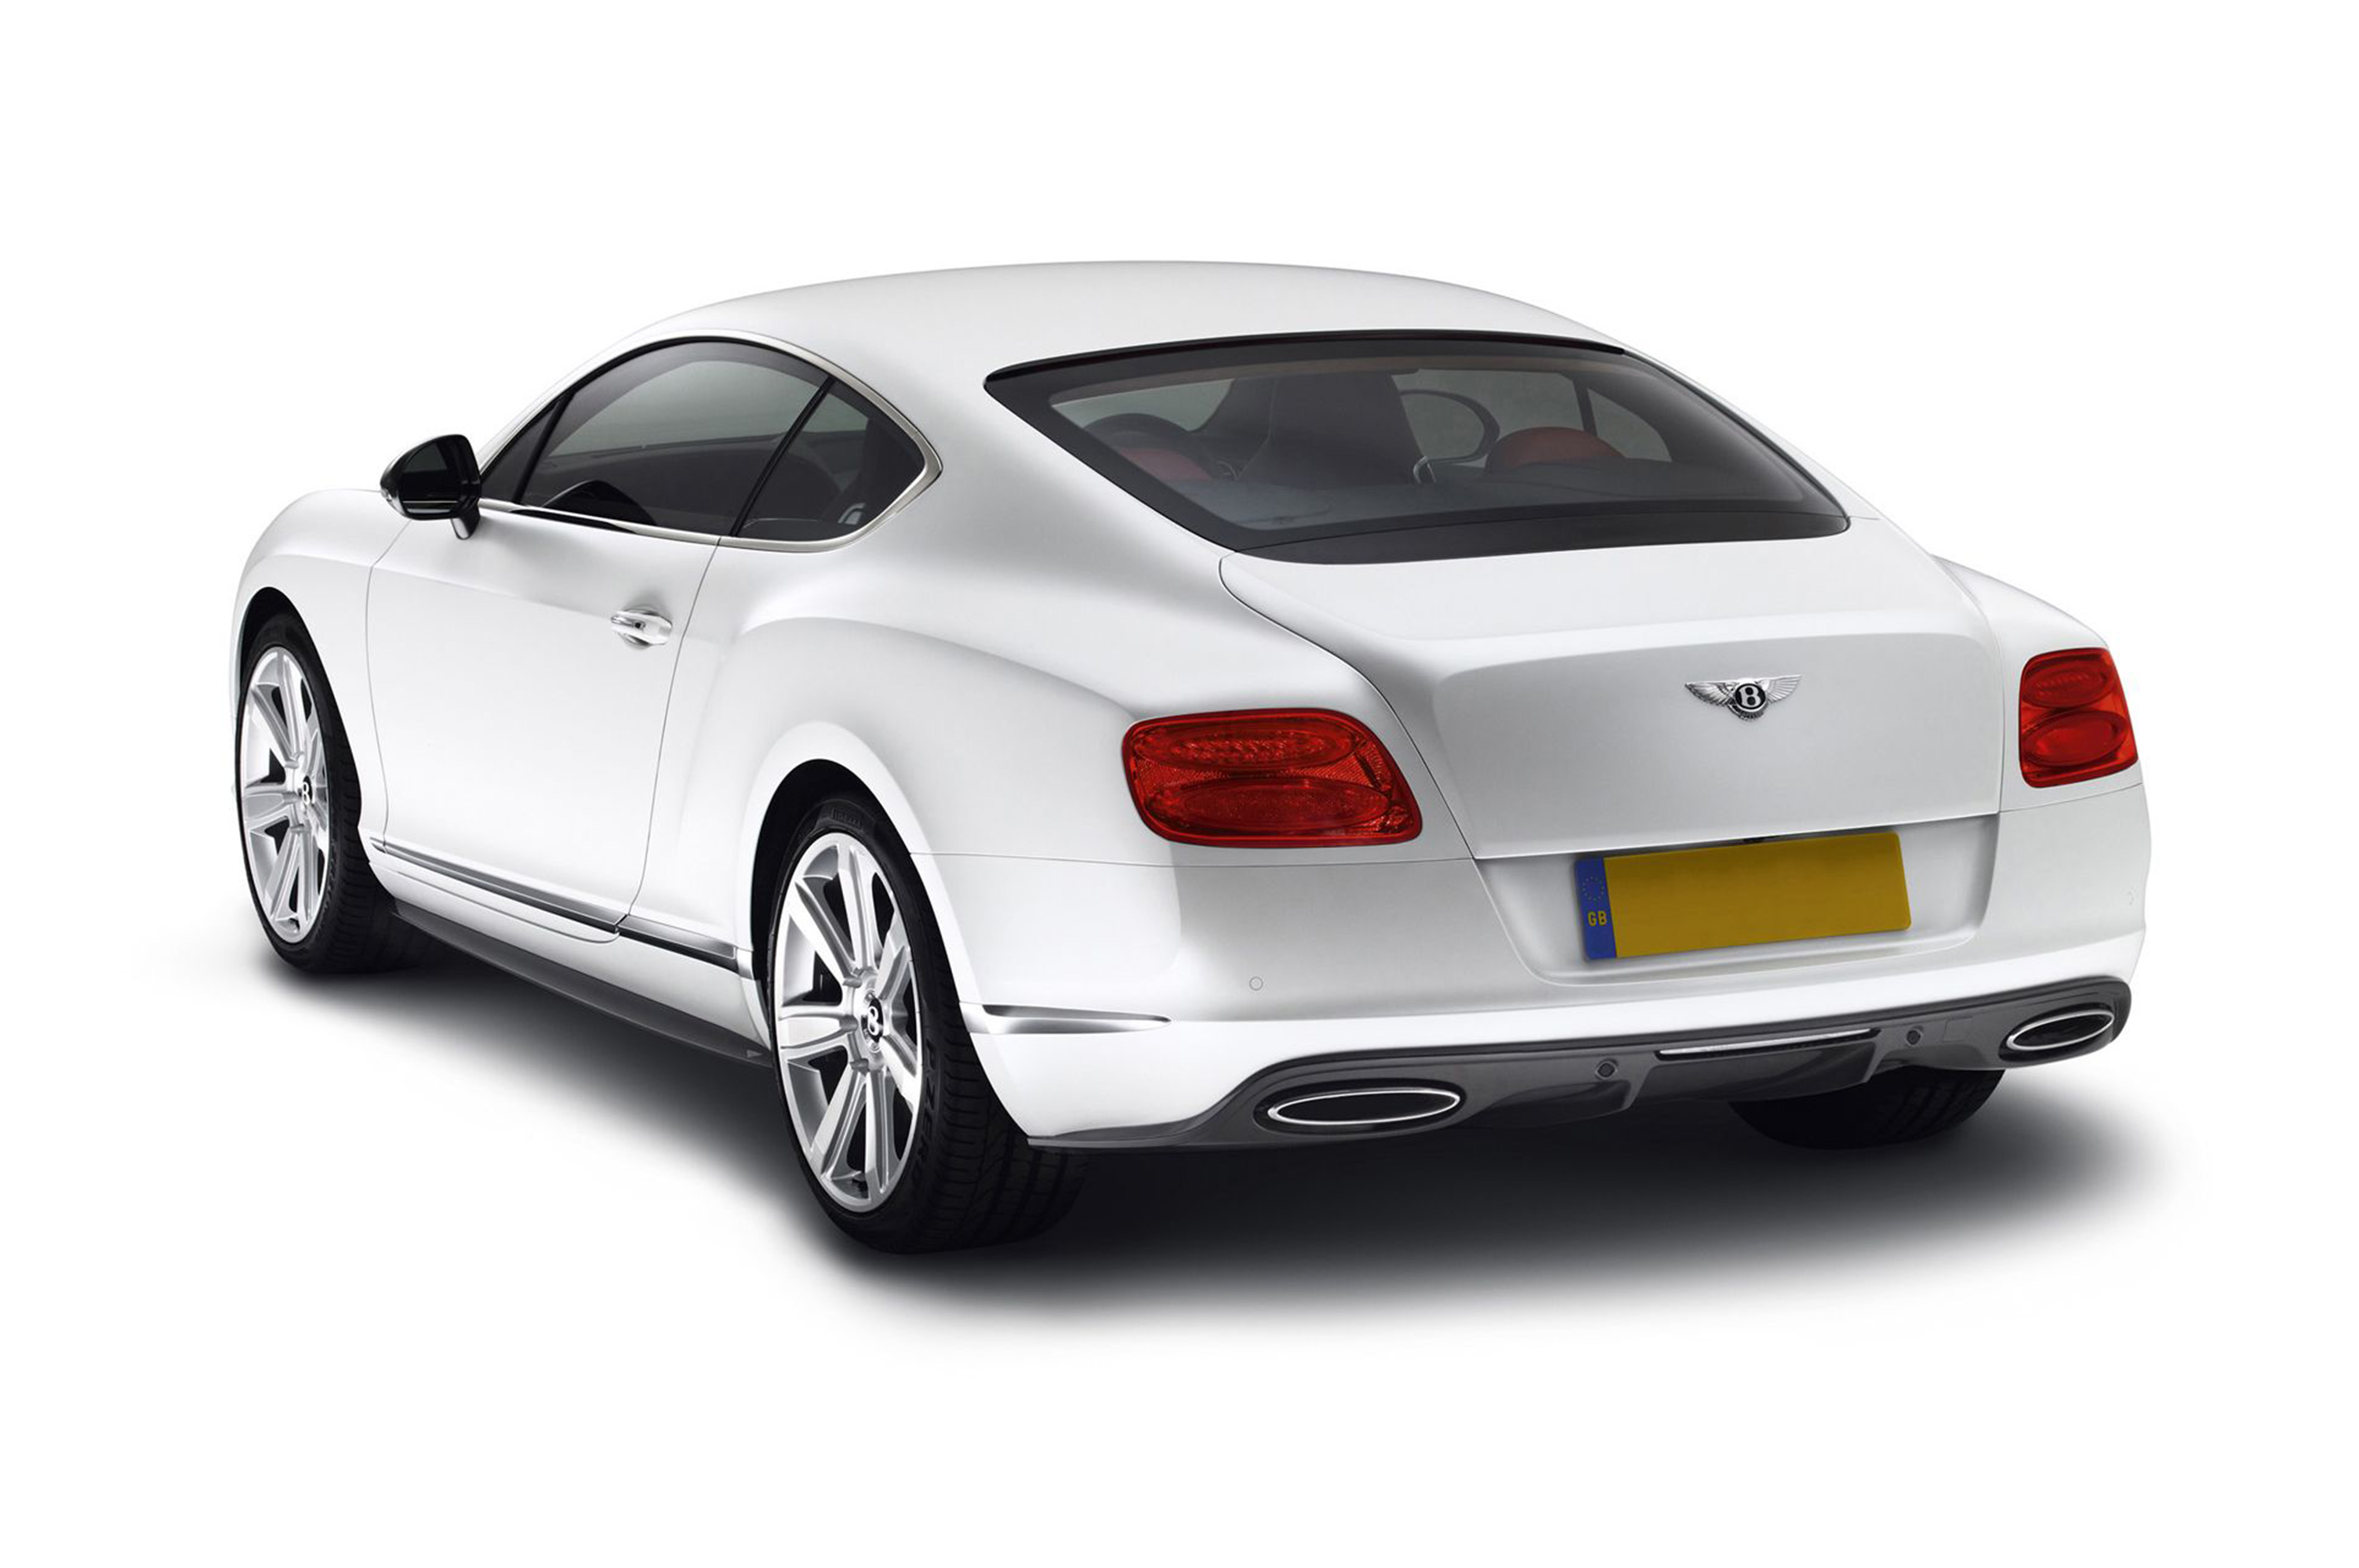 Bentley Continental GT & GTC Rear Lamps